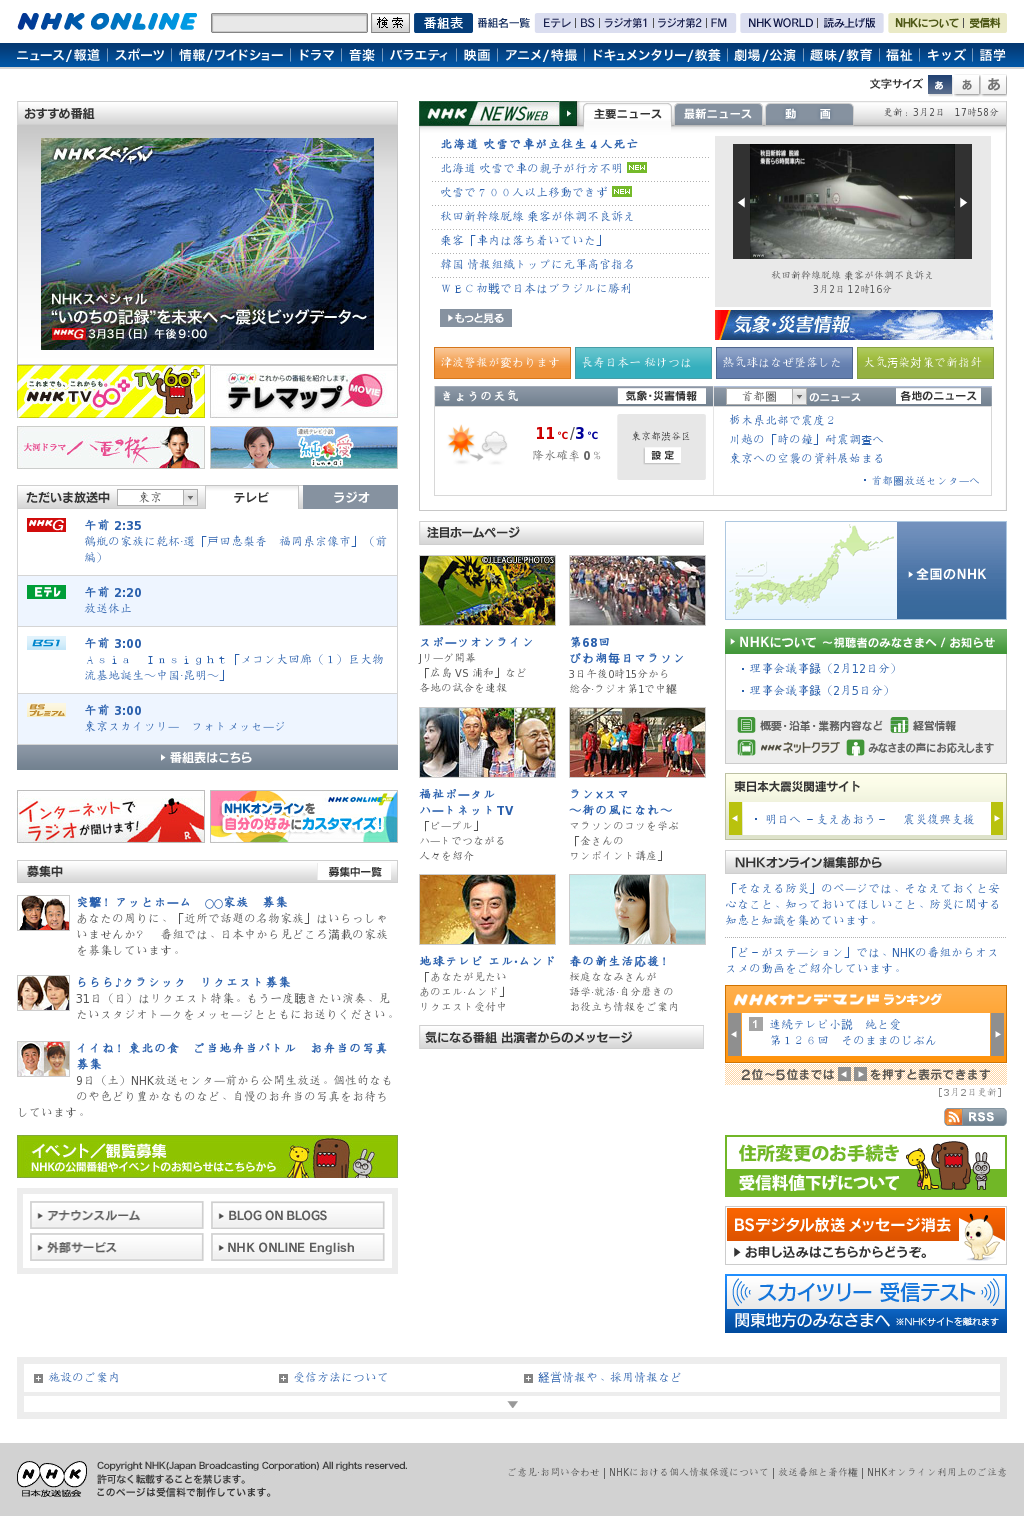 NHK Online at Saturday March 2, 2013, 6:17 p.m. UTC